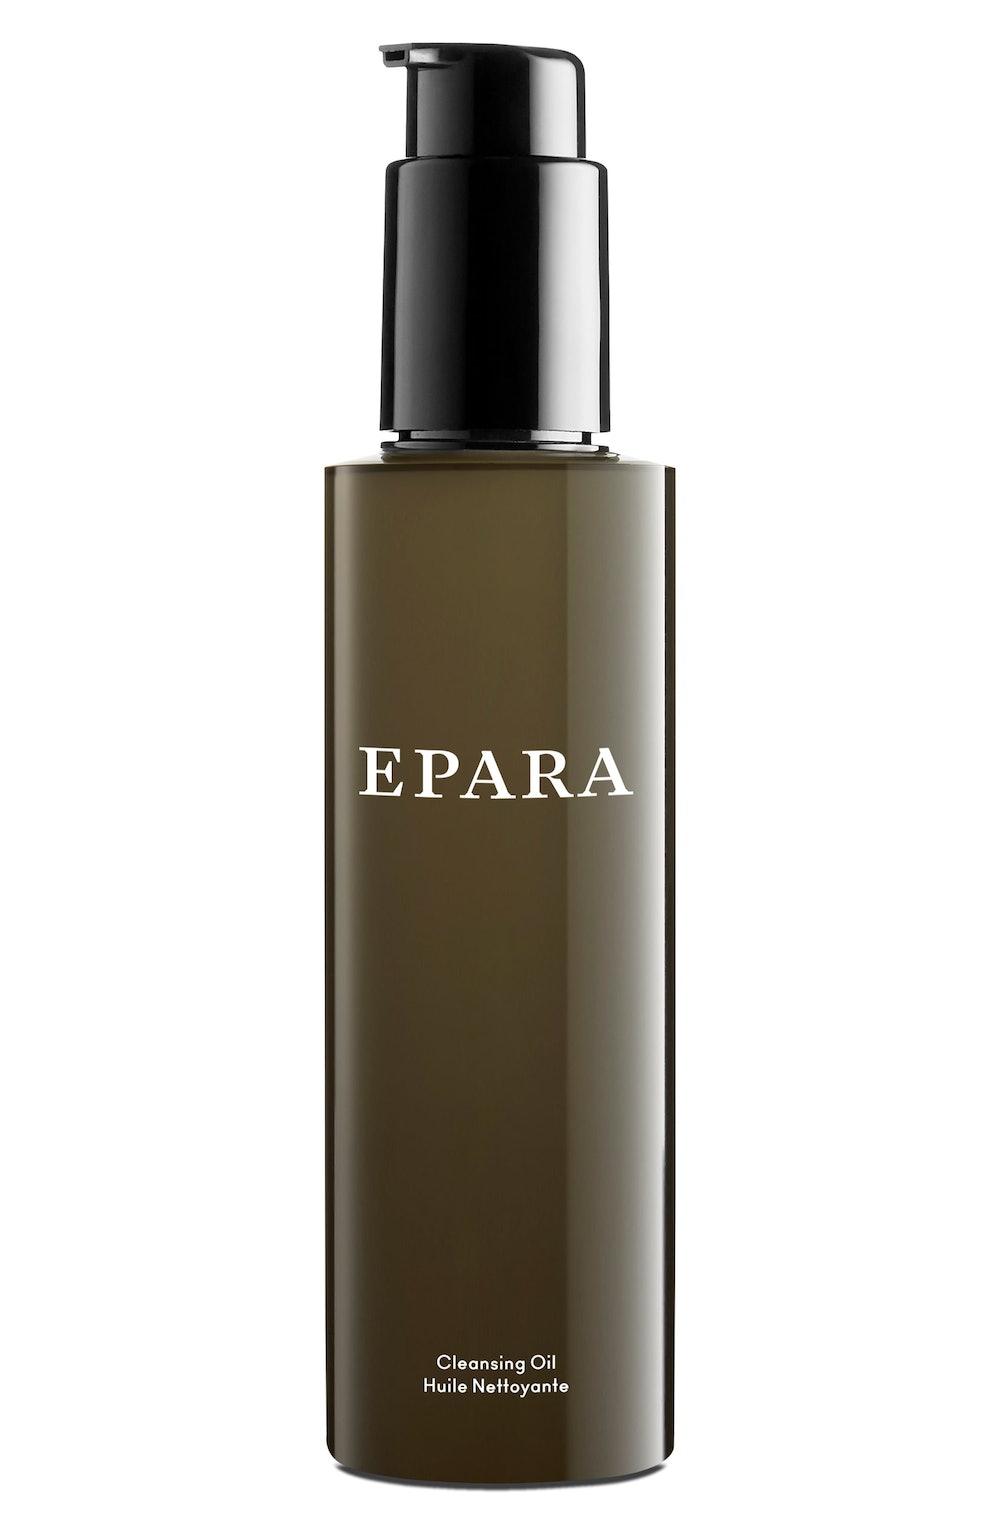 Epara Cleansing Oil